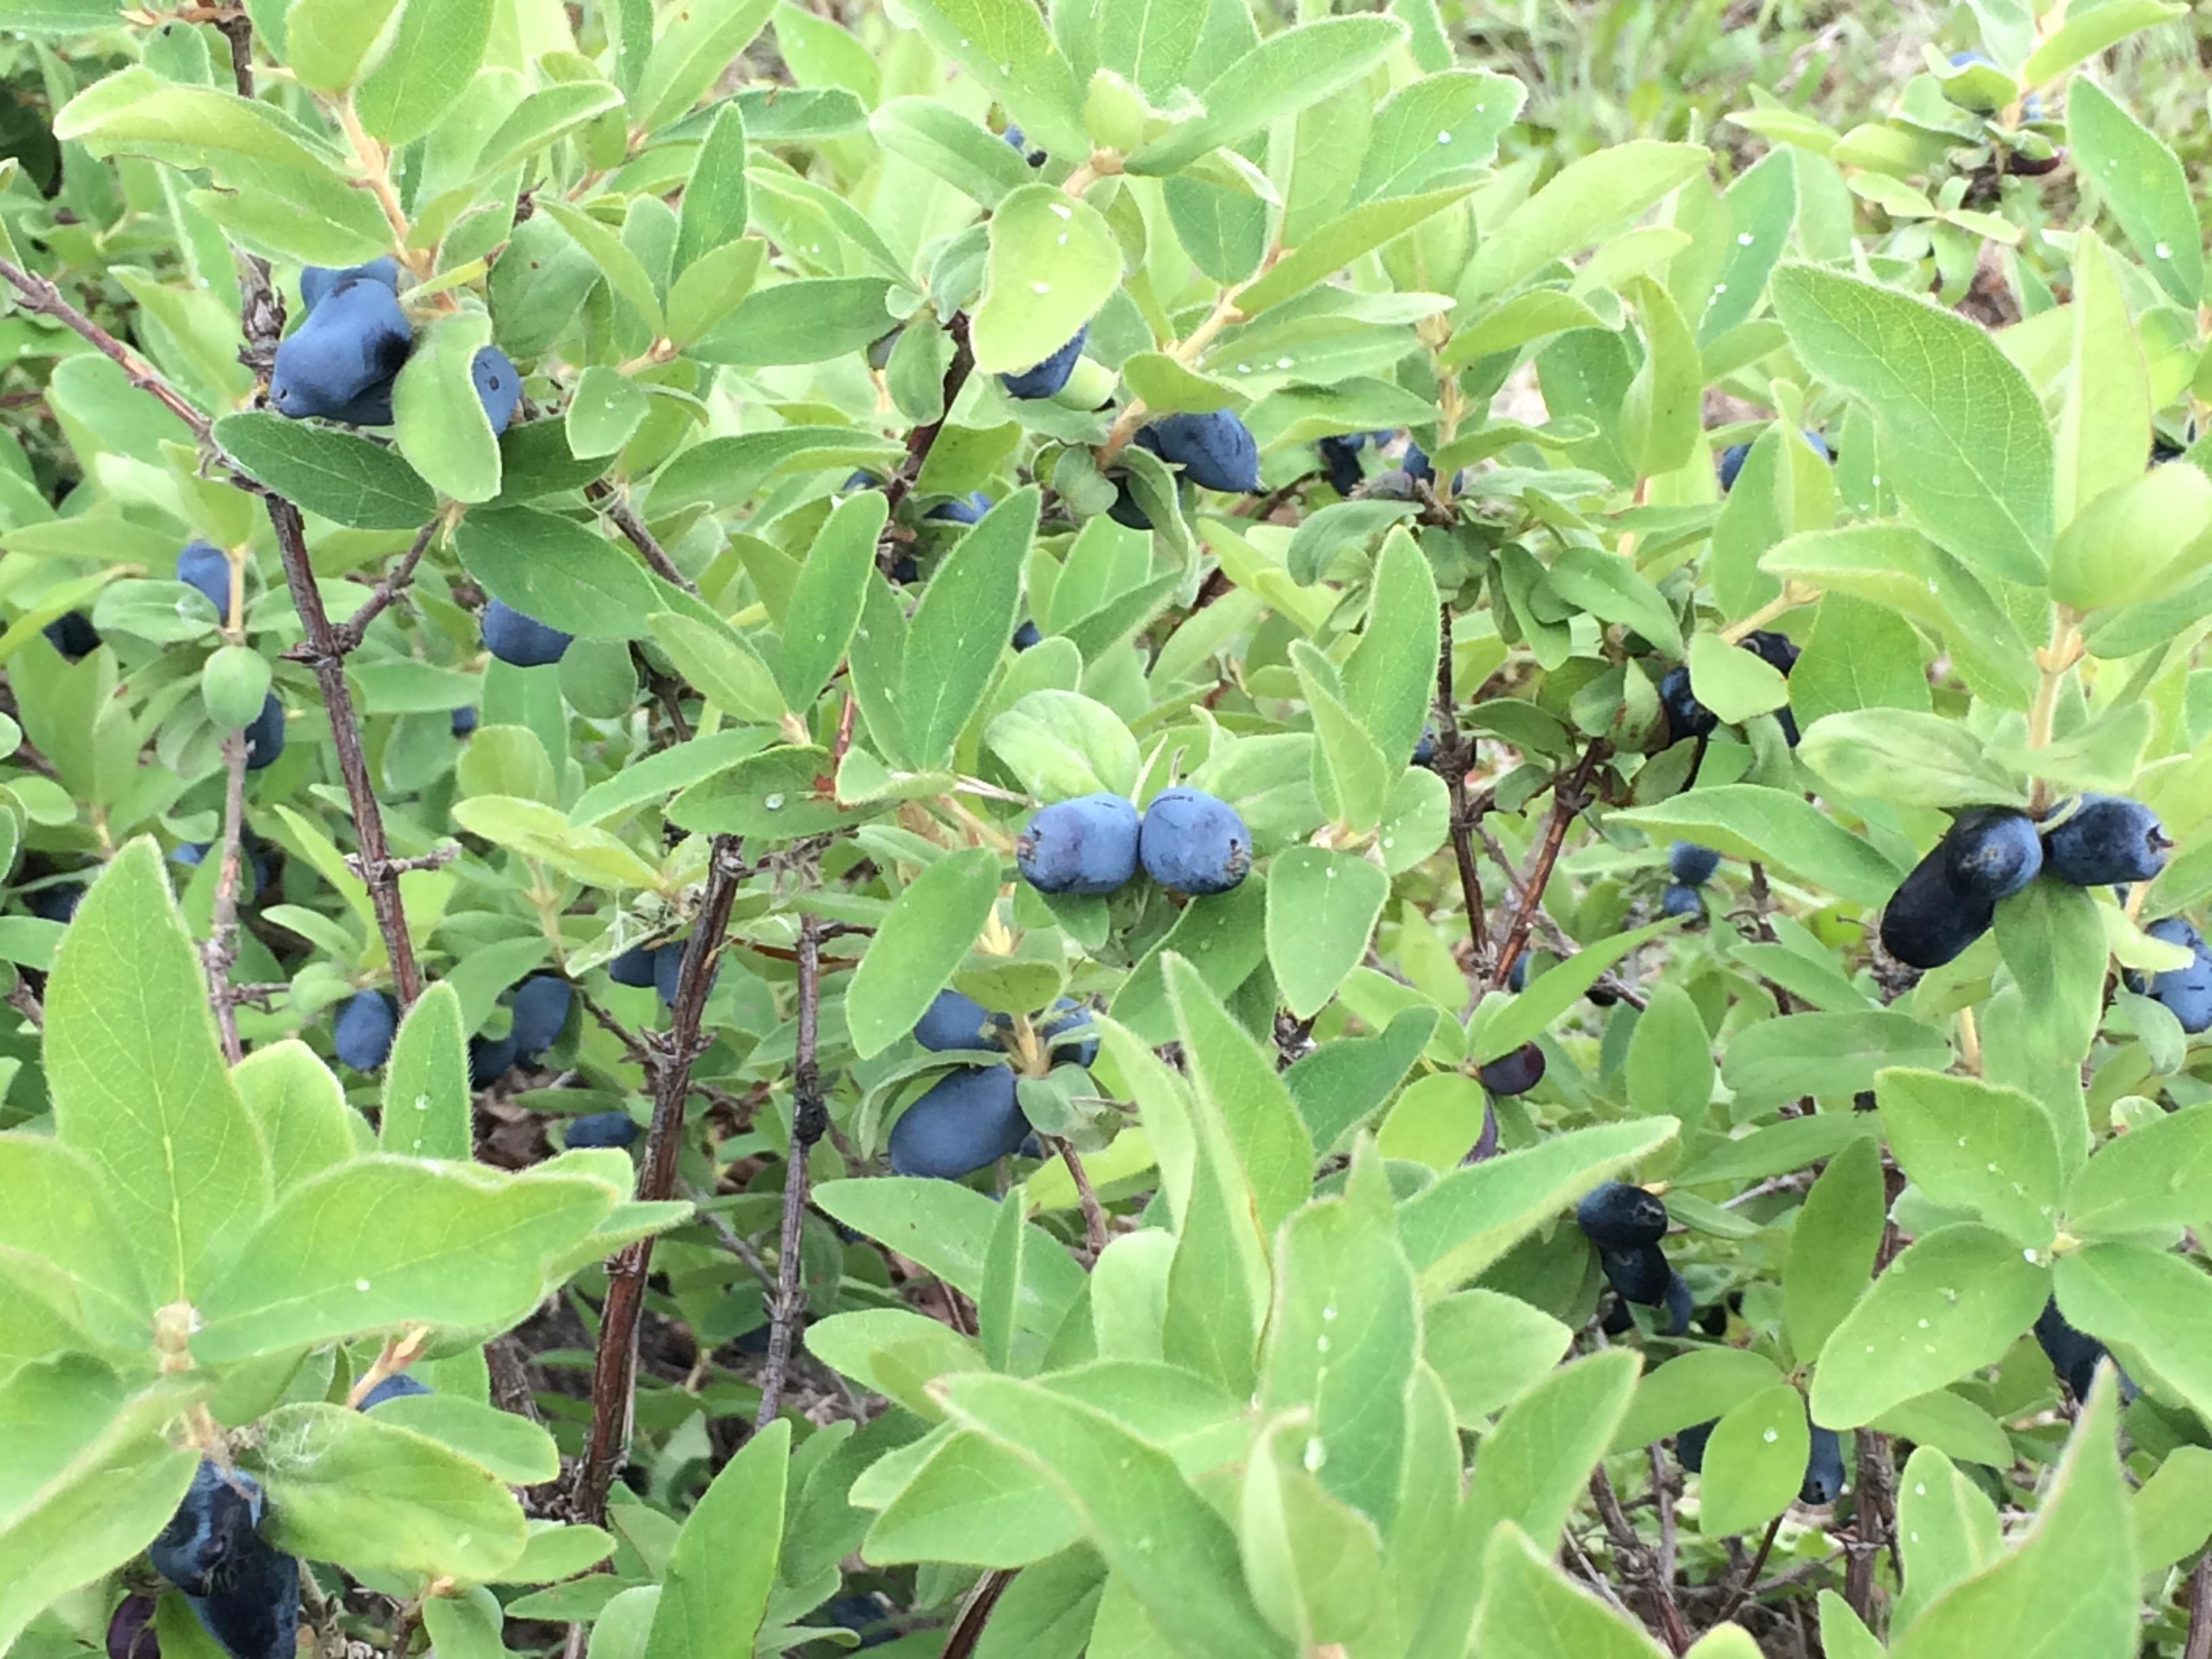 Haskap bush full of berries